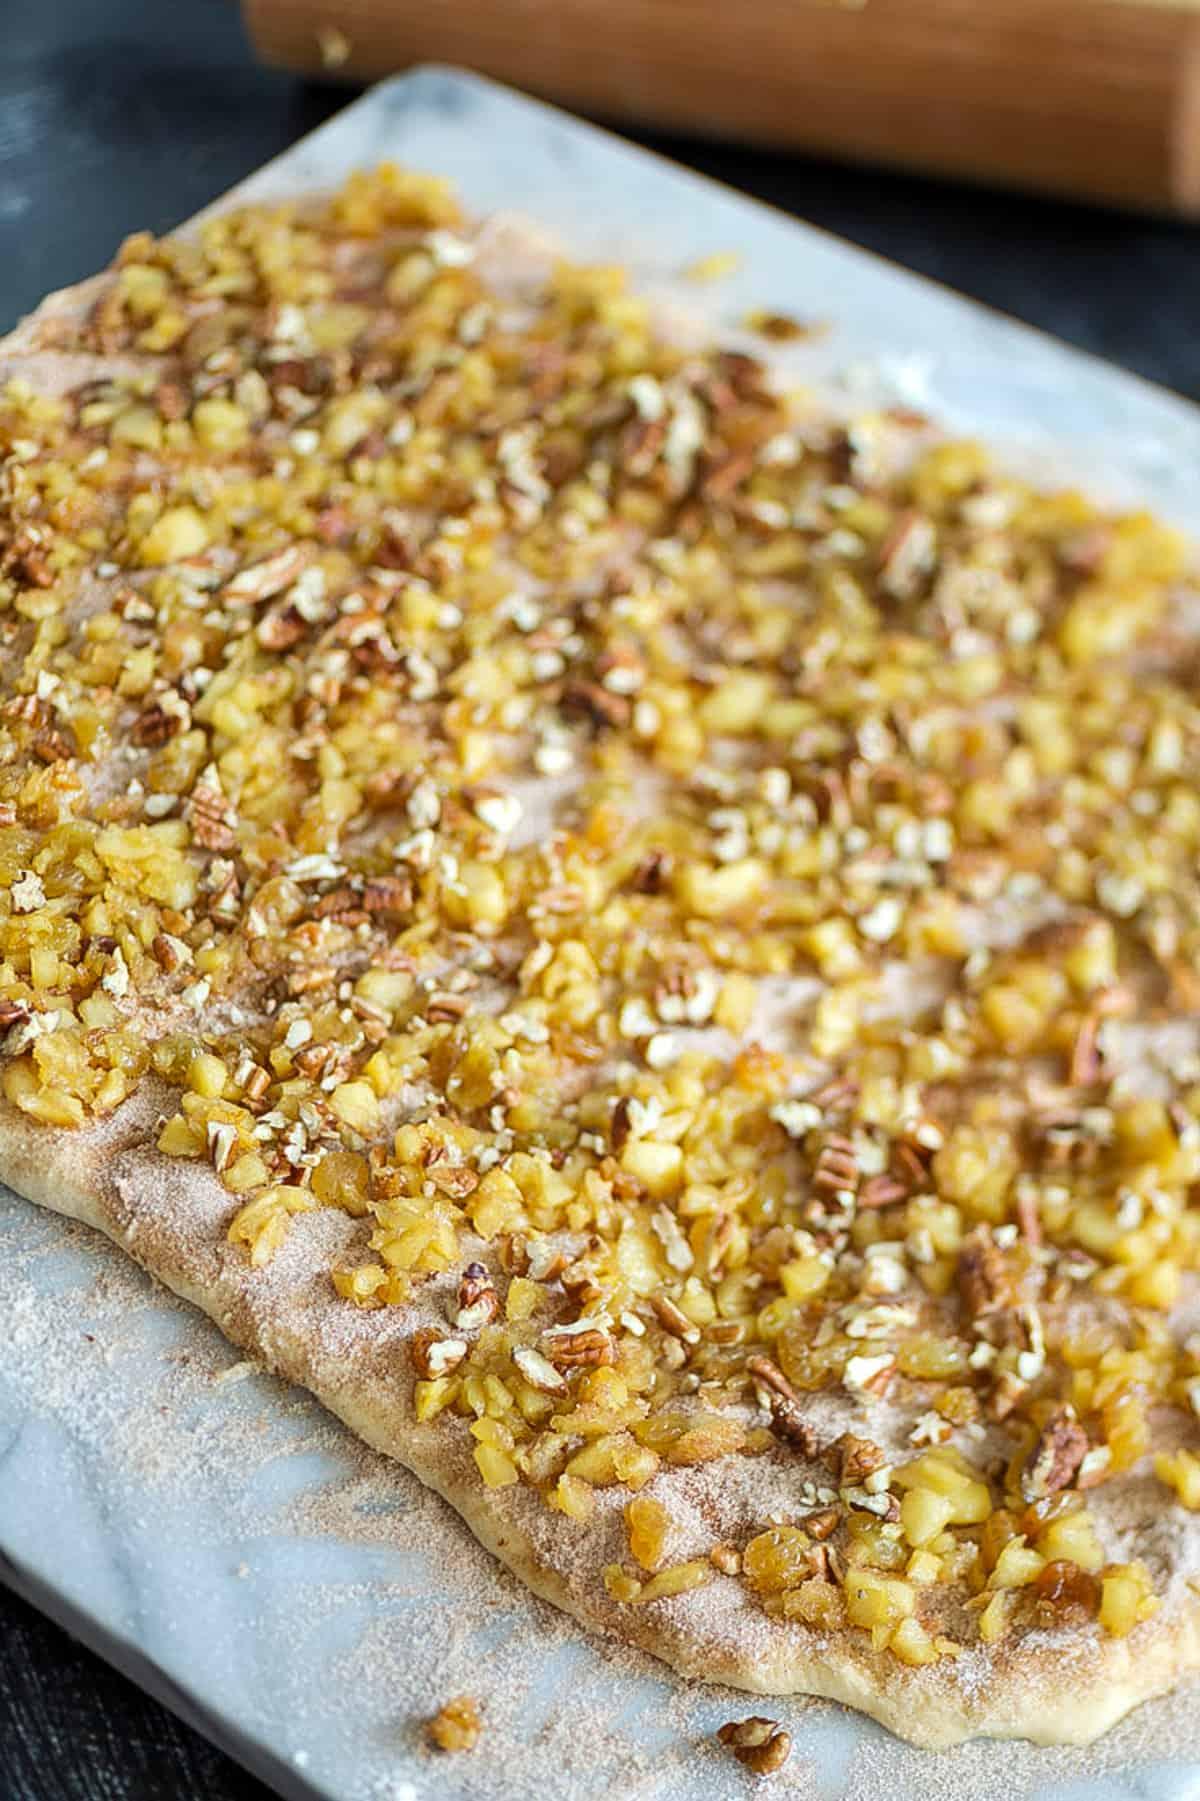 apples and raisins on cinnamon roll dough